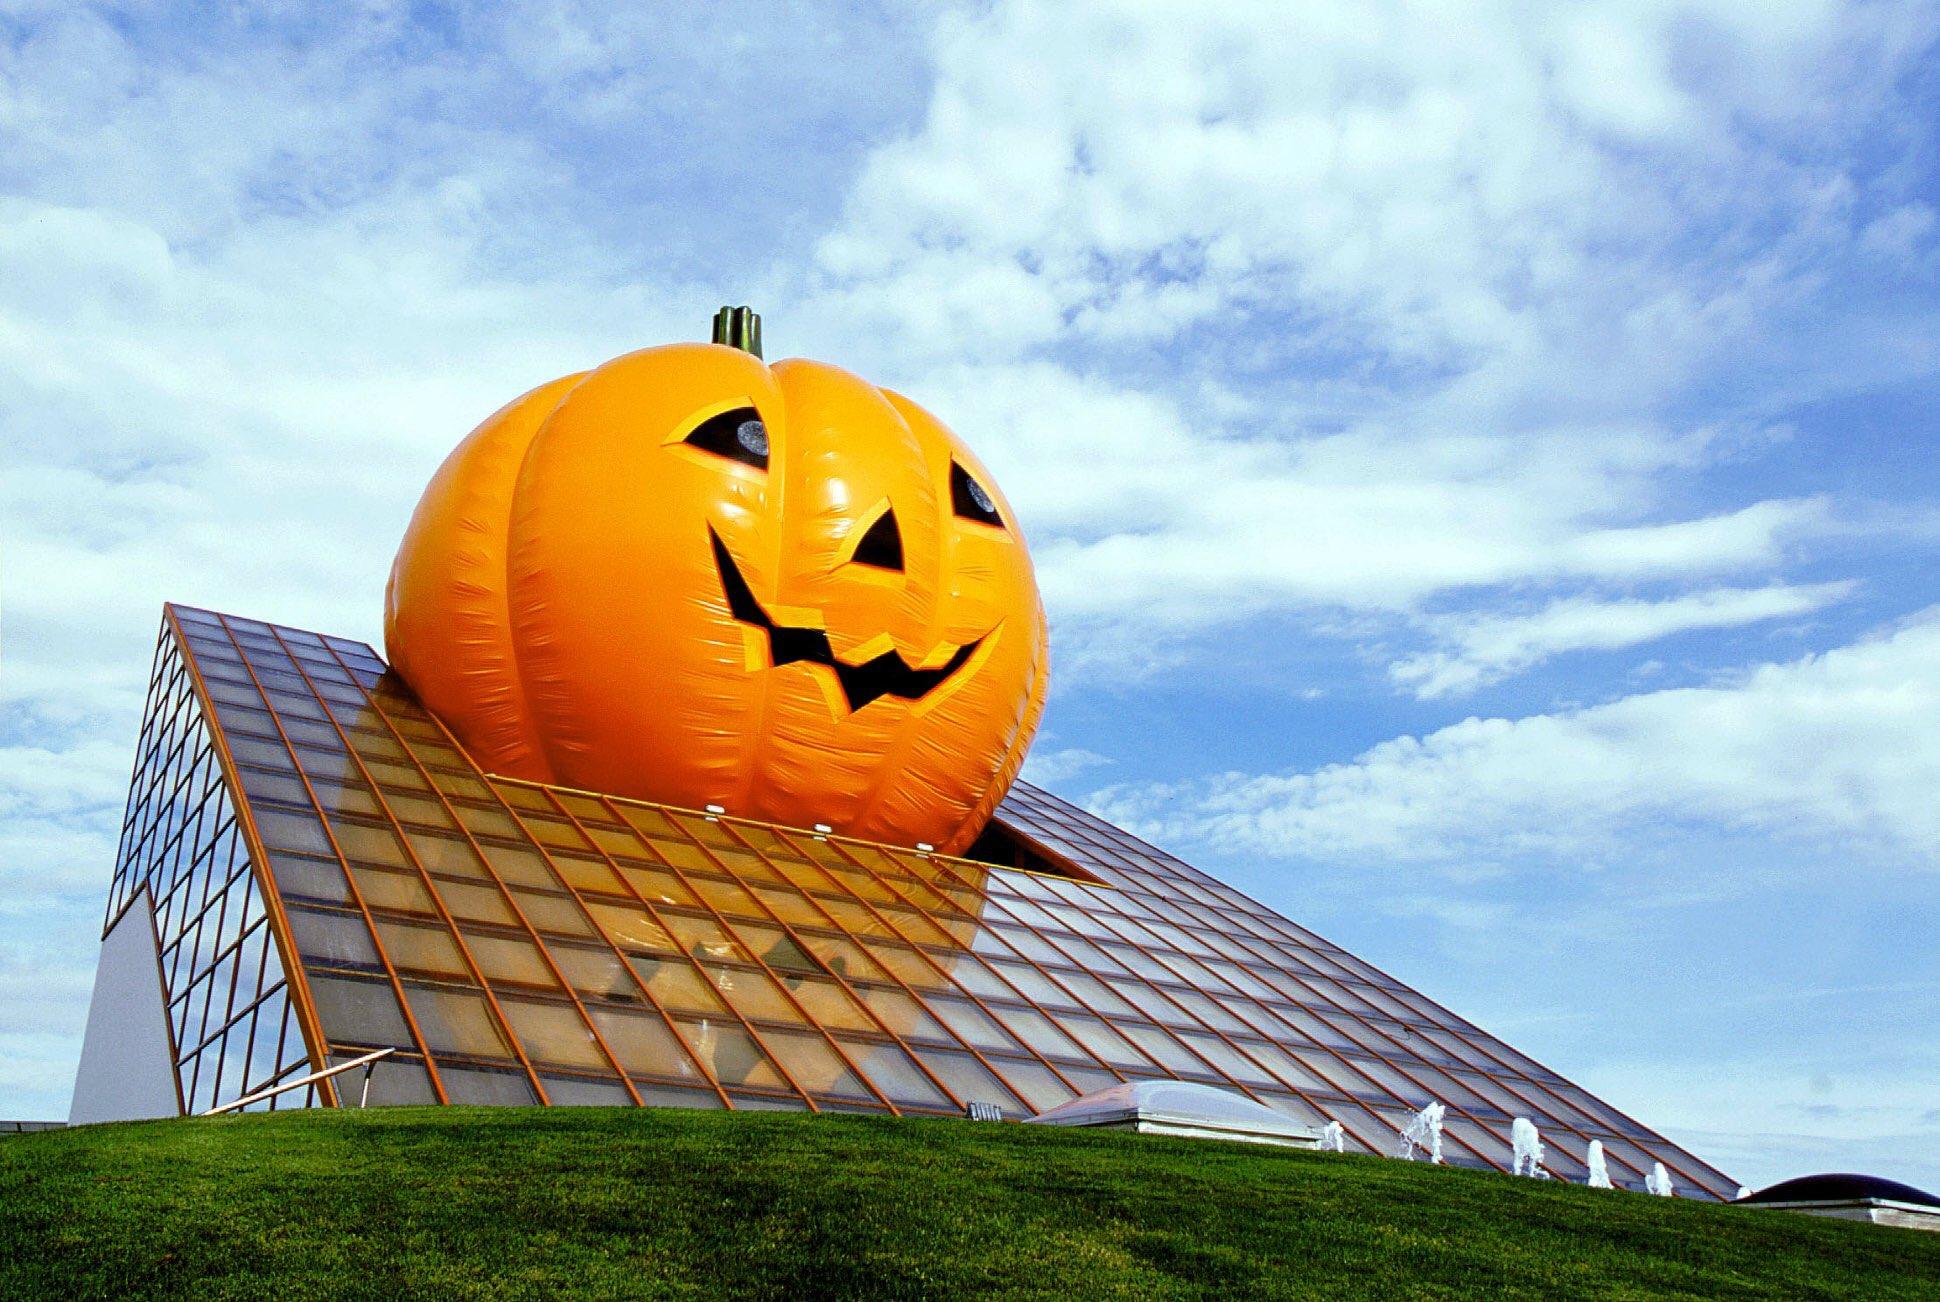 Futuroween - Halloween du 19 octobre au 3 novembre 2019 EIPgt-Qi-Ws-AAKORW-format-jpg-name-large